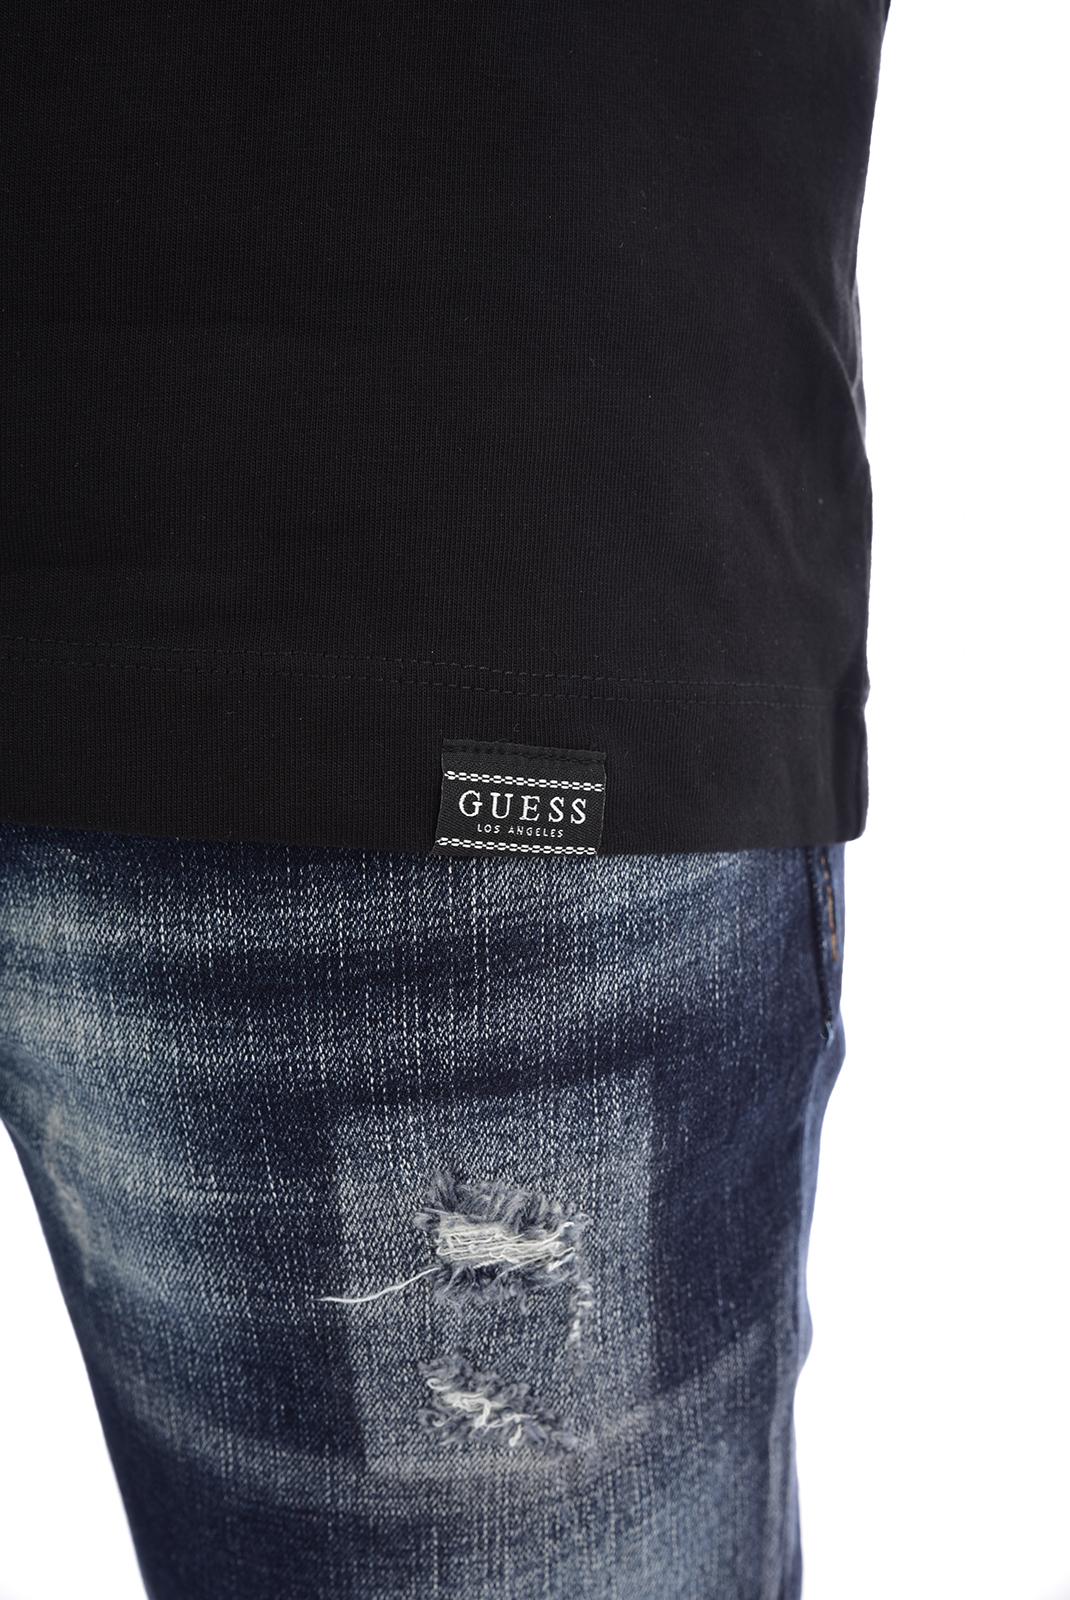 T-S manches longues  Guess jeans M93I48 K8FQ0CN LS URBAN JBLK Jet Black A996